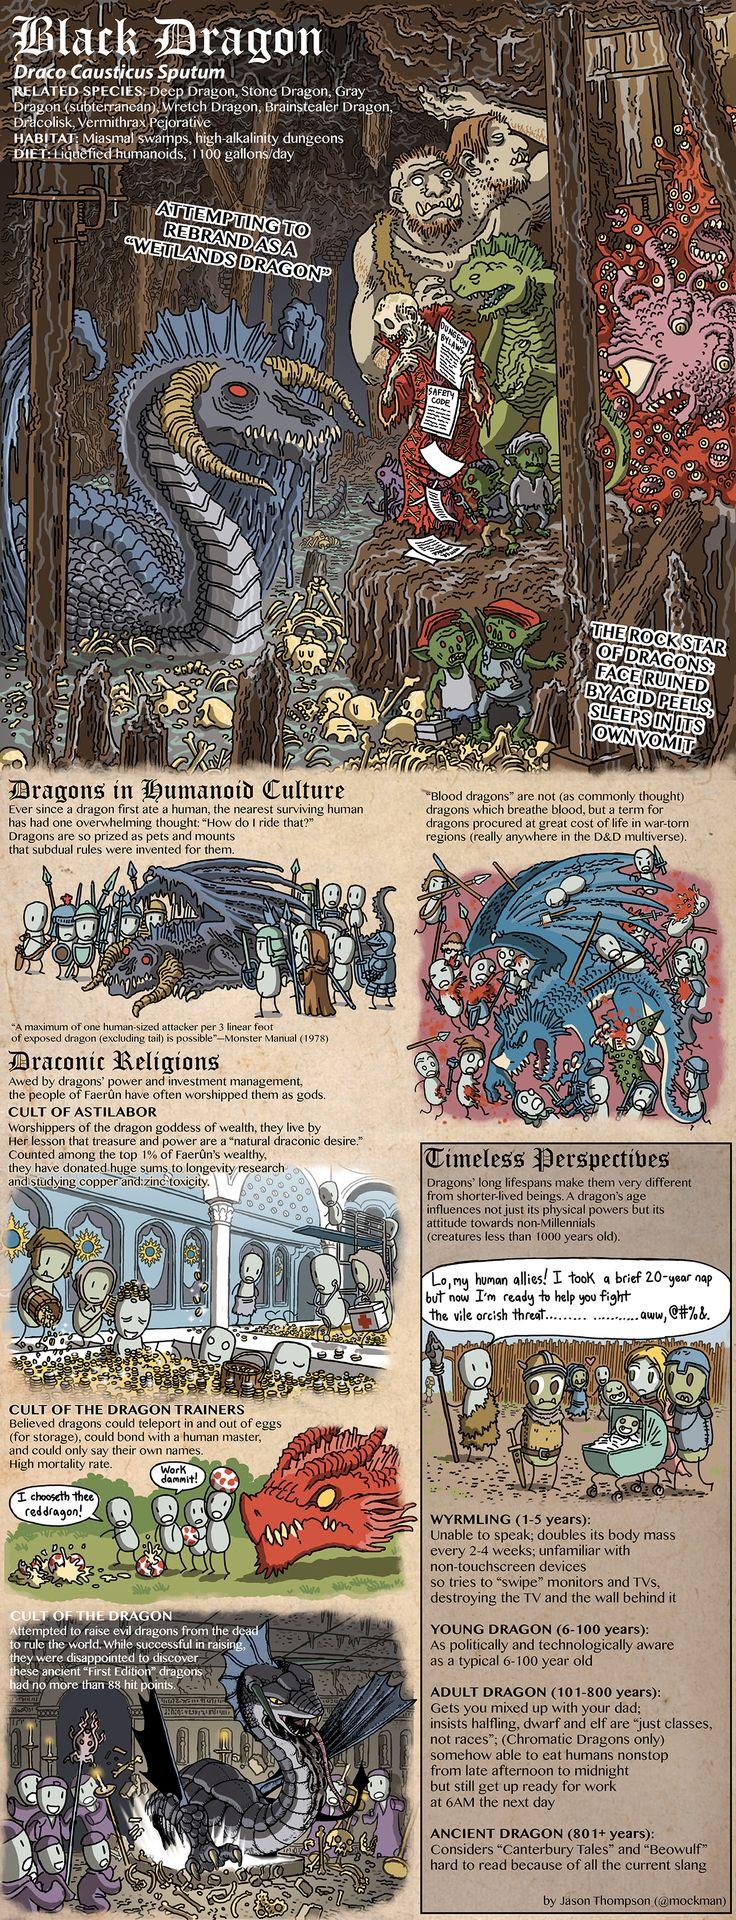 http://media.wizards.com/2015/images/dnd/articles/Toon_BlackDragon.jpg